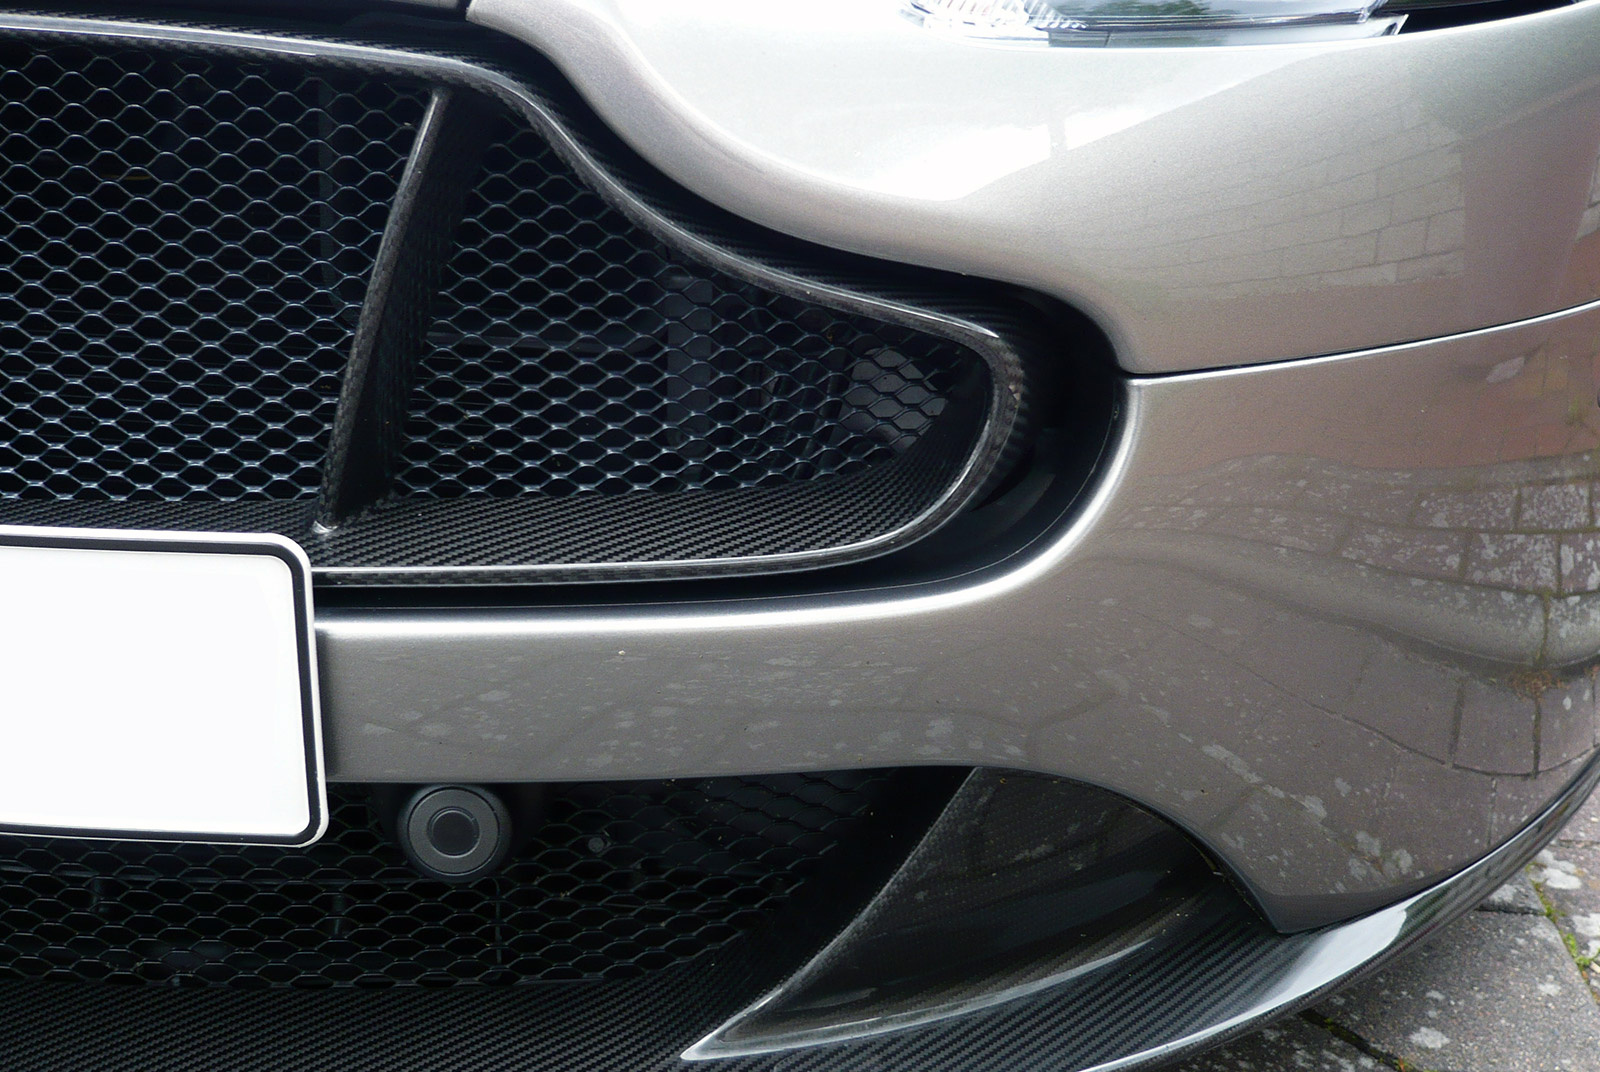 AM-2995-Aston-Martin_V12-Vantage-S_Grau_Schwarz_16